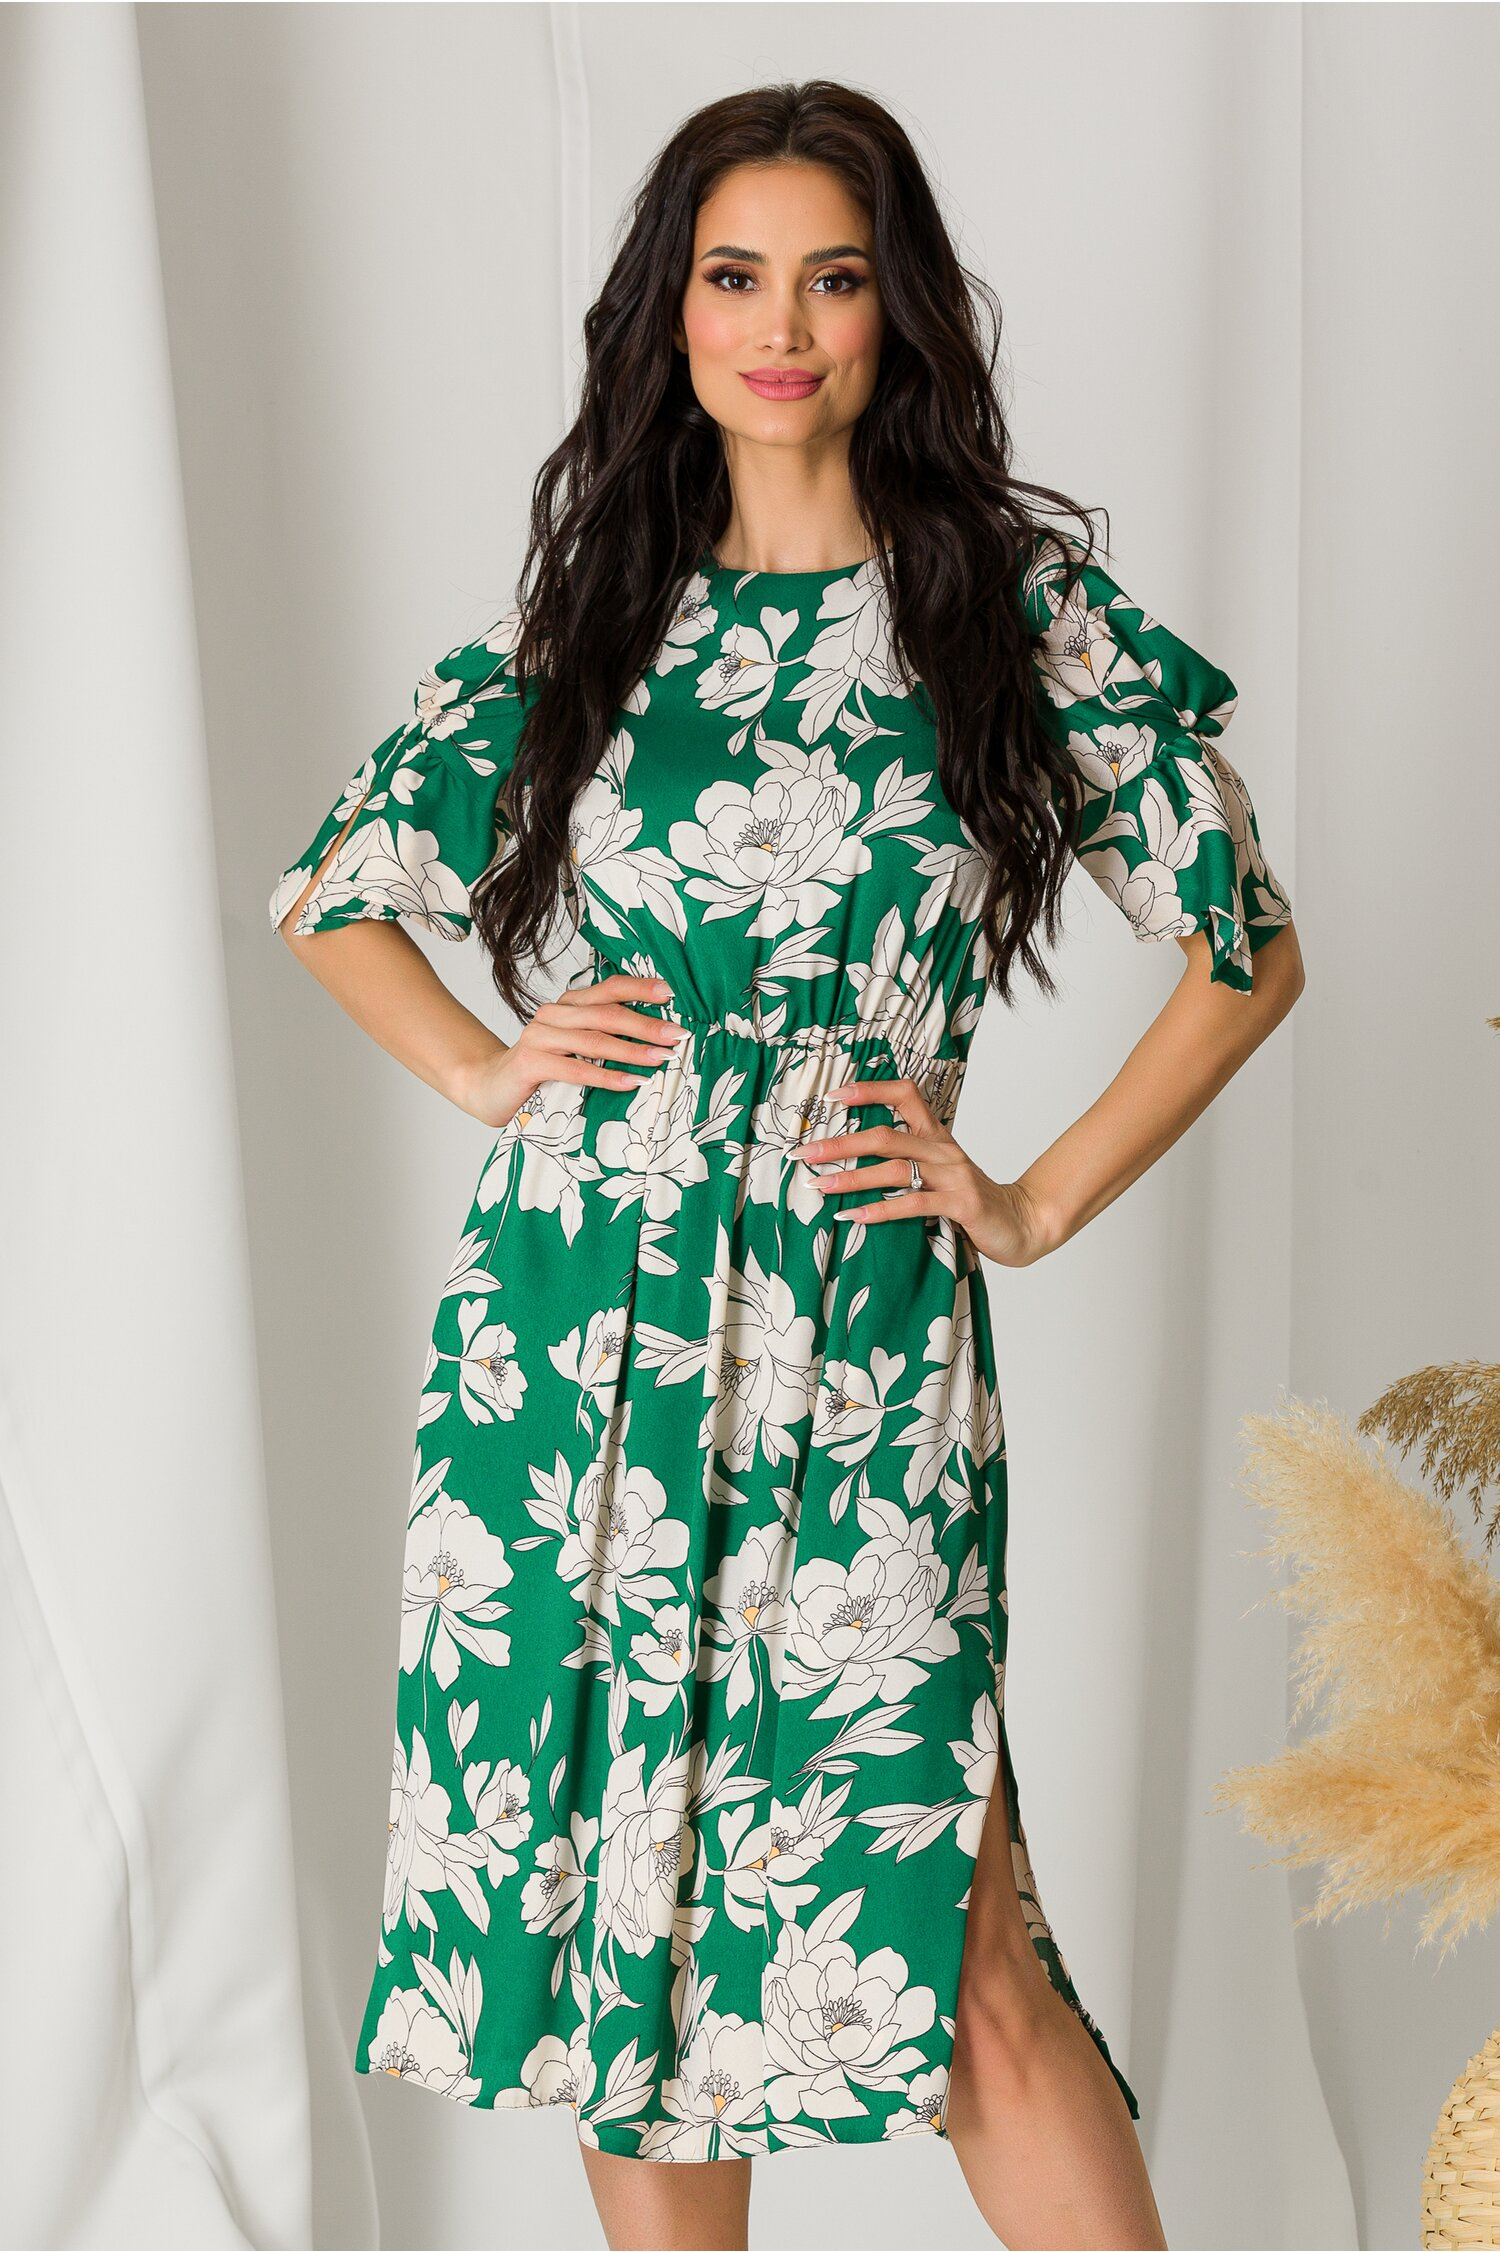 Rochie Moze verde cu imprimeuri florale bej imagine dyfashion.ro 2021